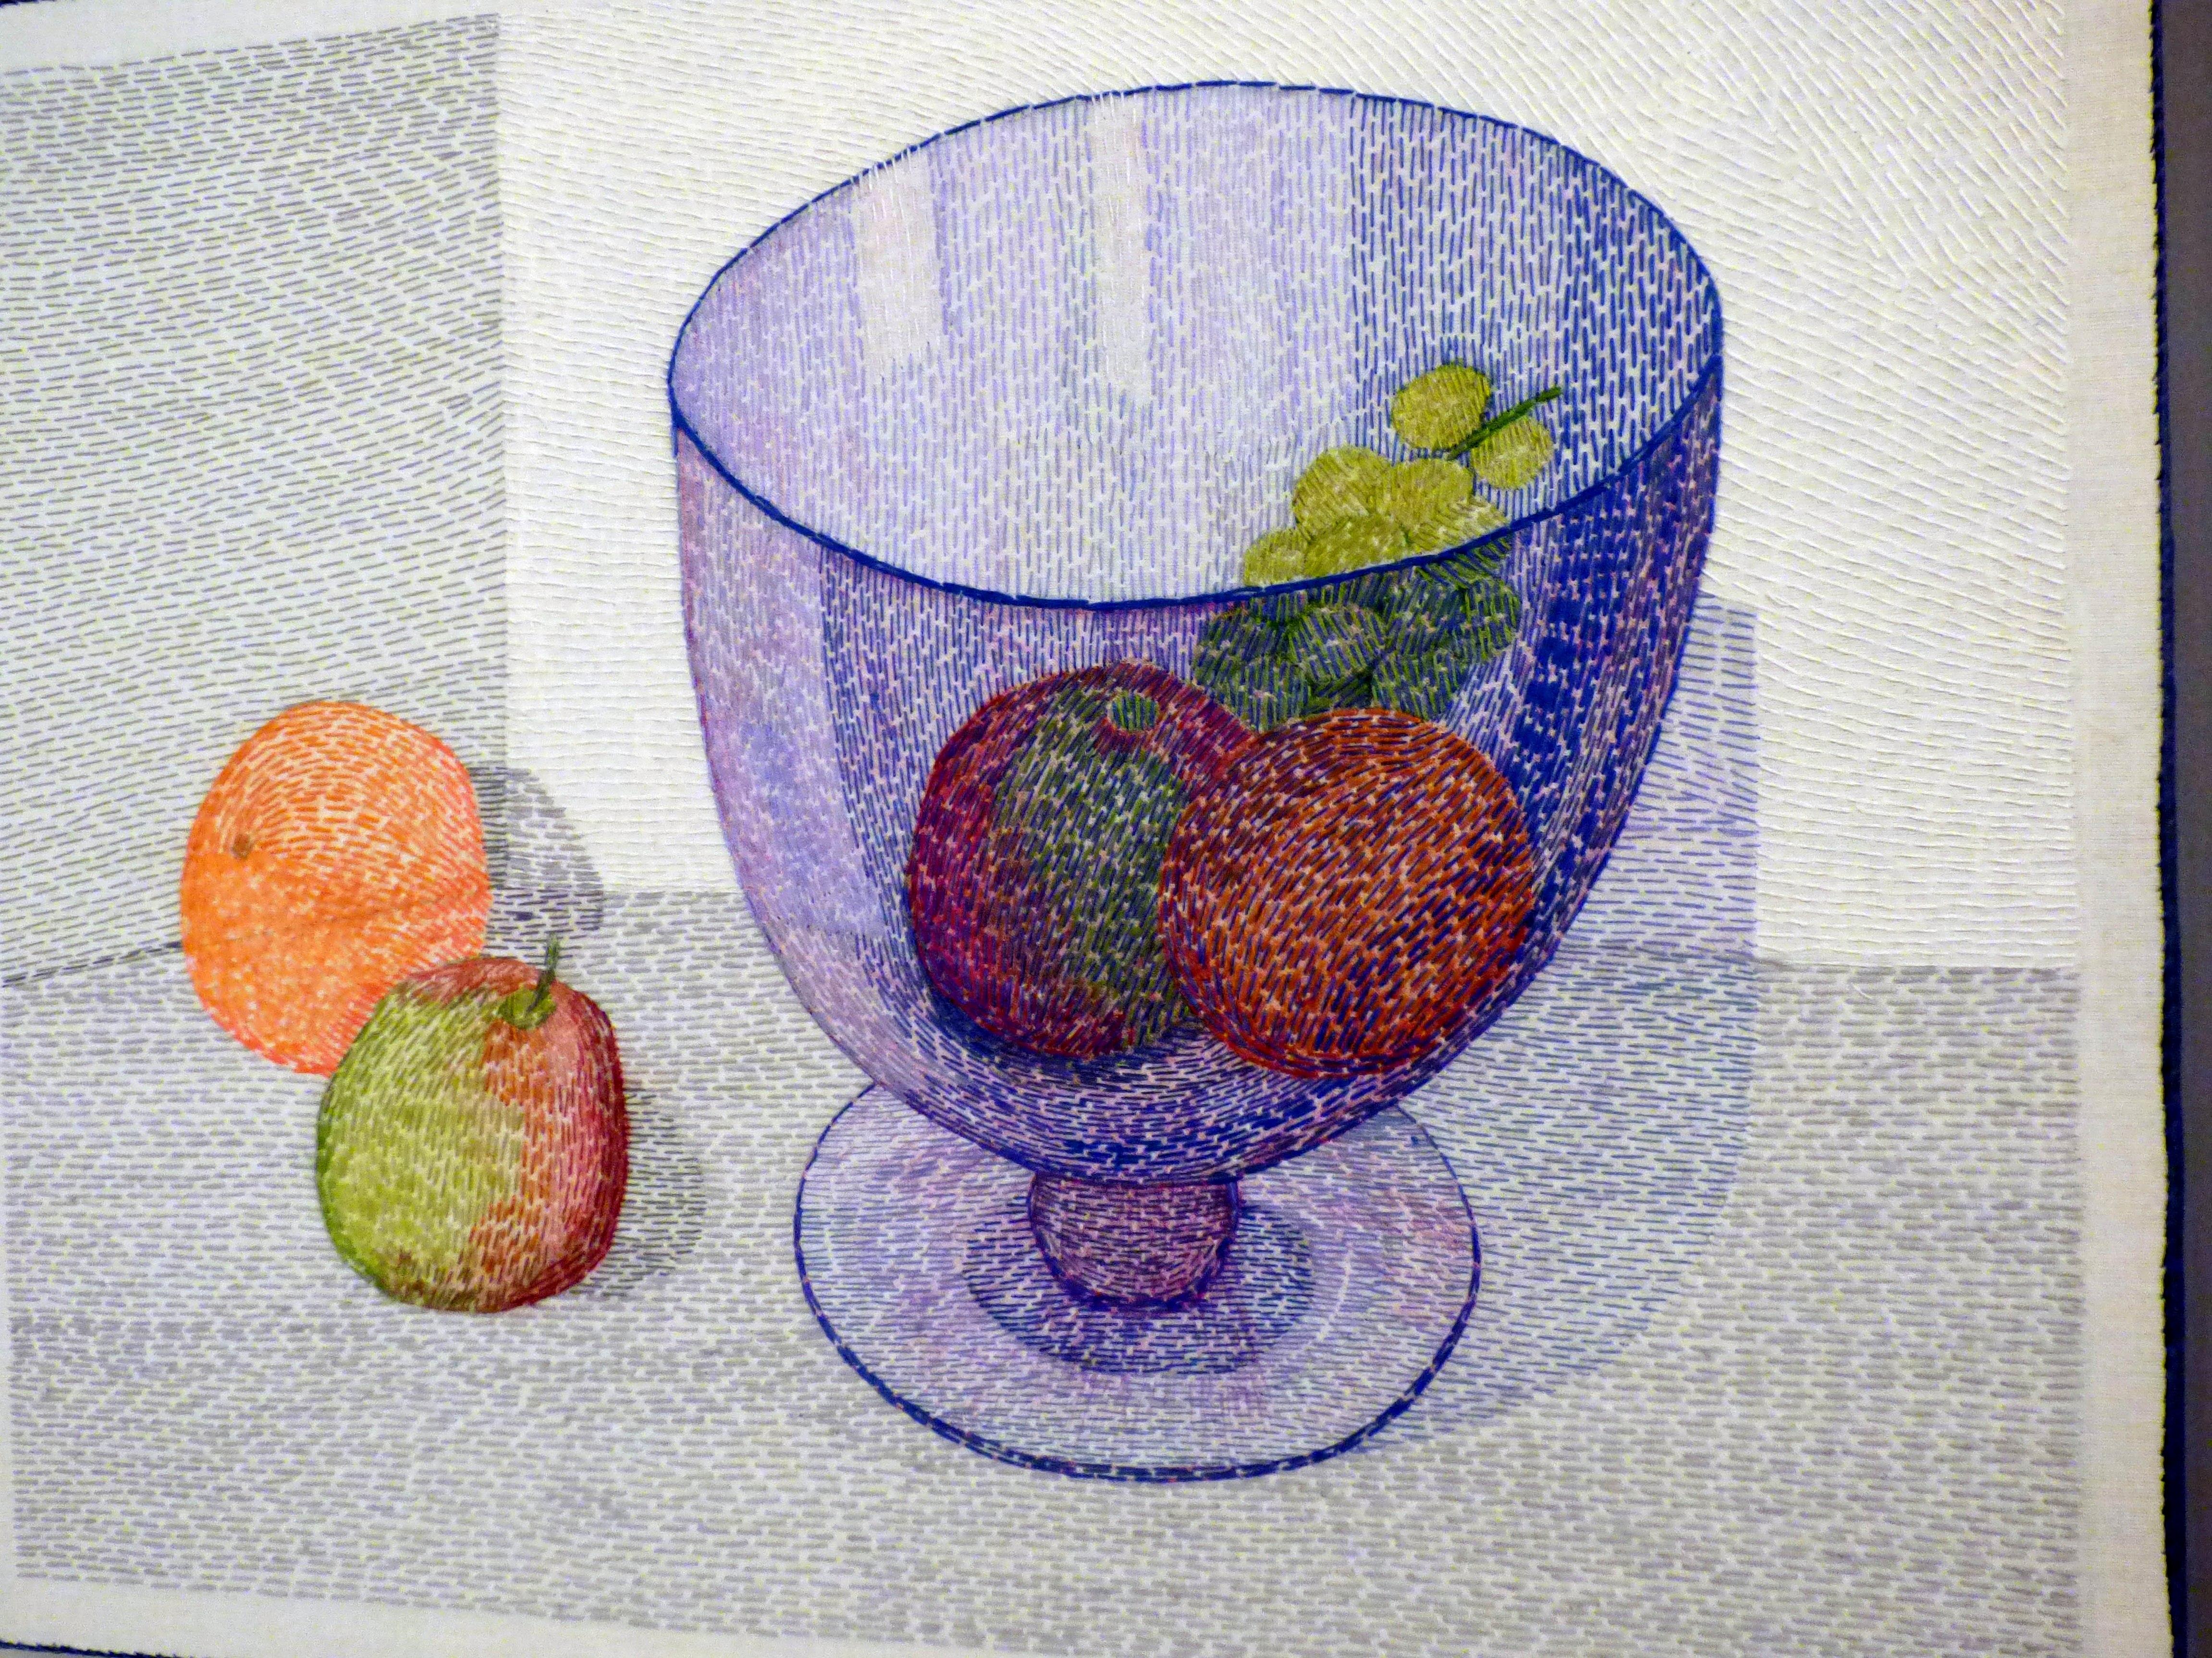 THE BIG BLUE BOWL by Audrey Walker, hand stitch, 2013